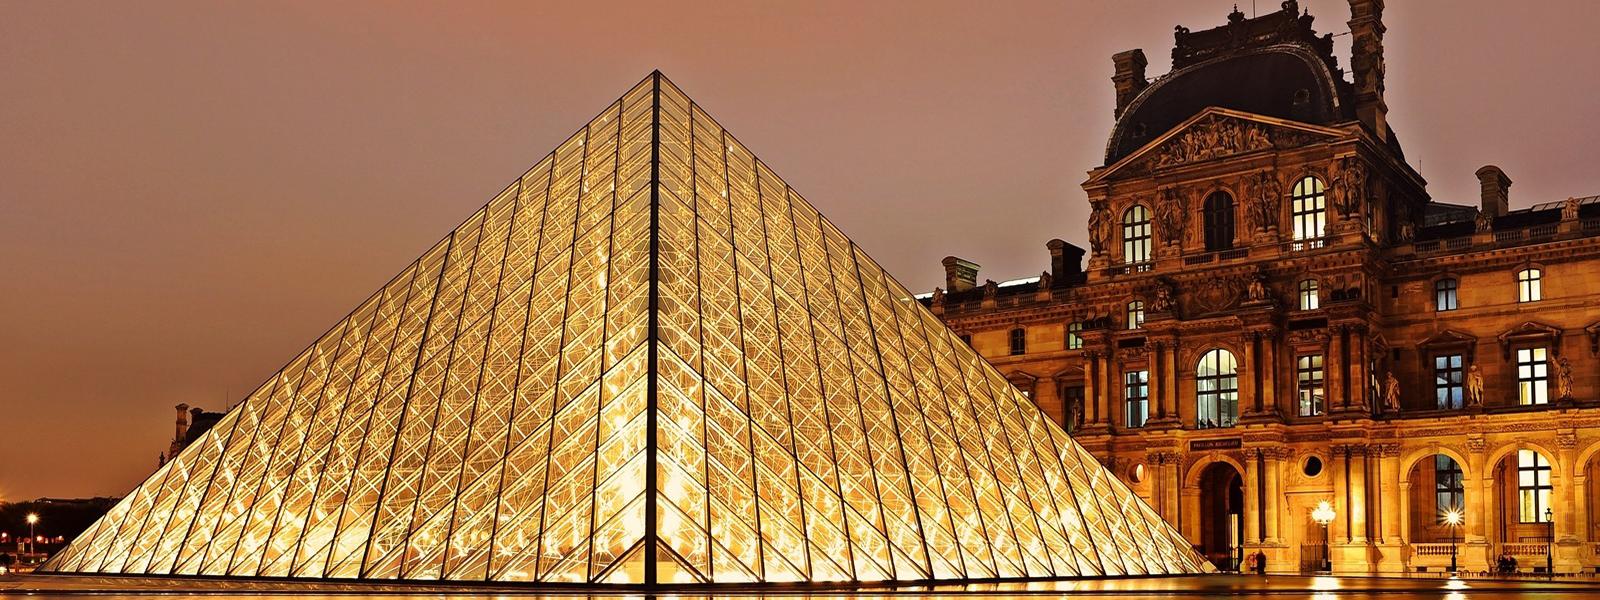 LouvreHomePage1600x600